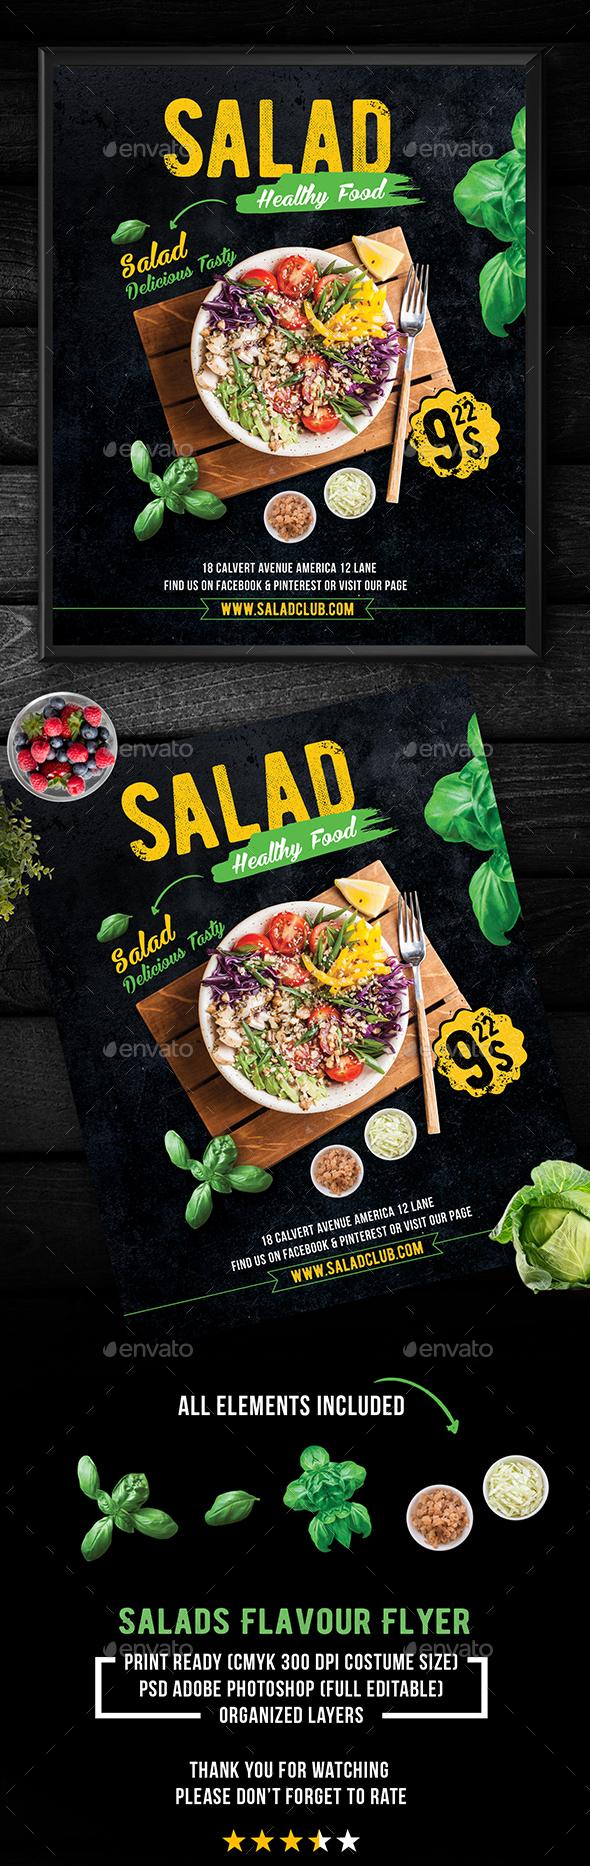 Salad Flavor Flyer Template - Flyers Print Templates